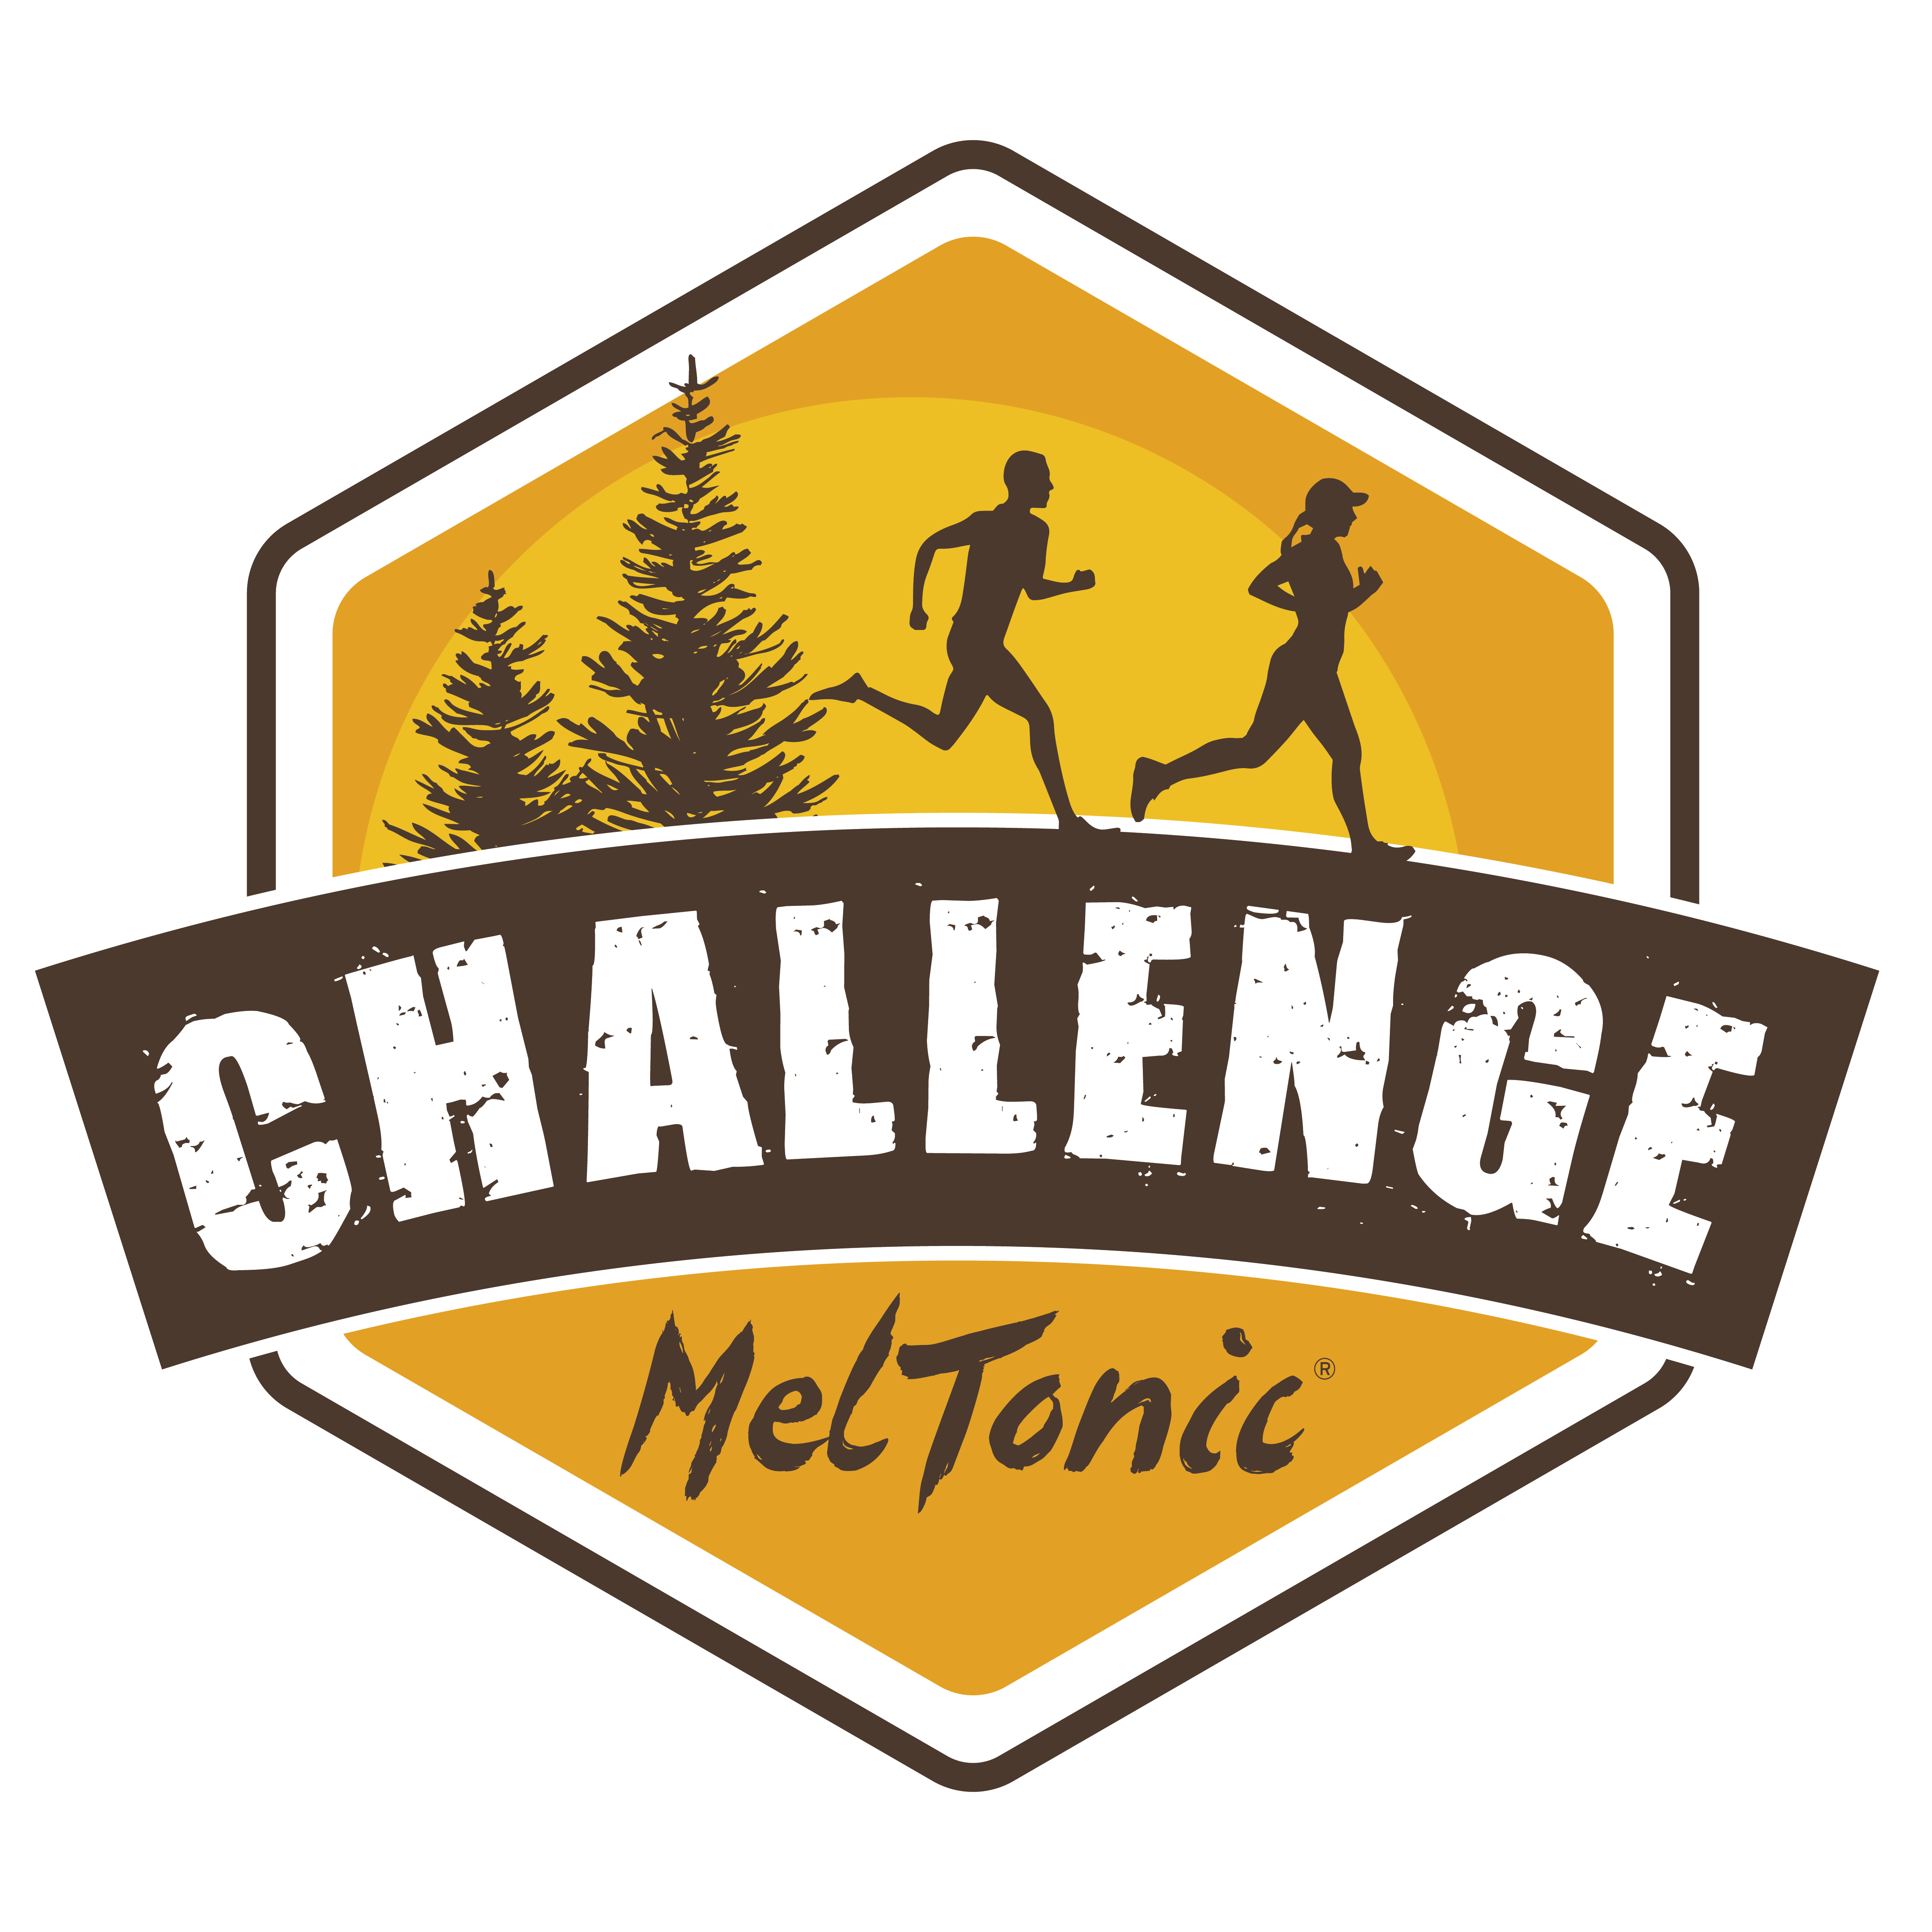 logo du challenge meltonic 2021